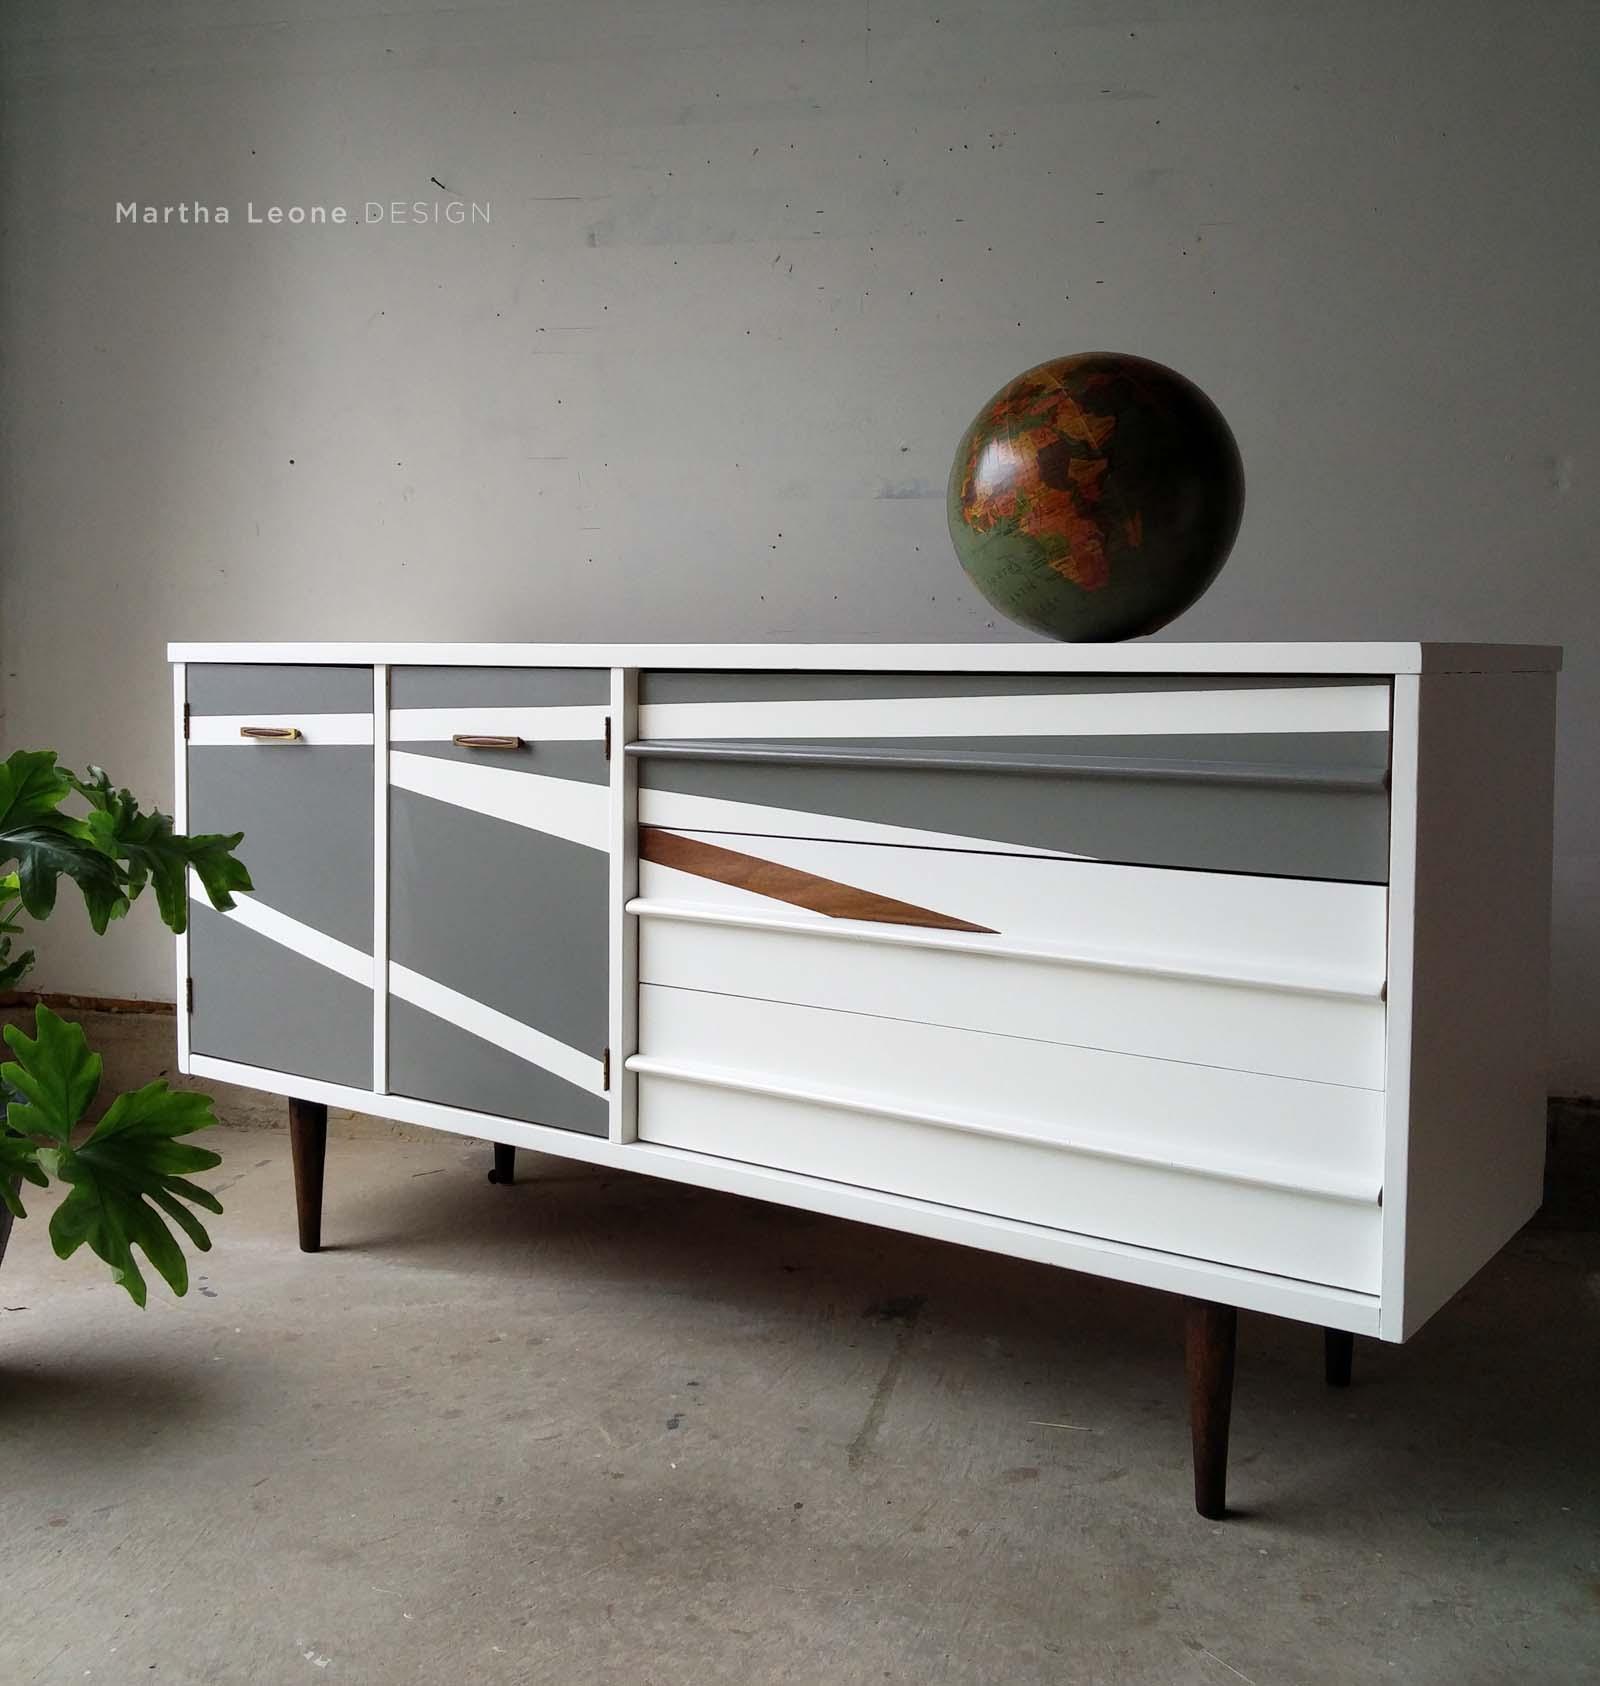 For    Kerra Michele Interiors    — Client's bedroom, Washington, DC